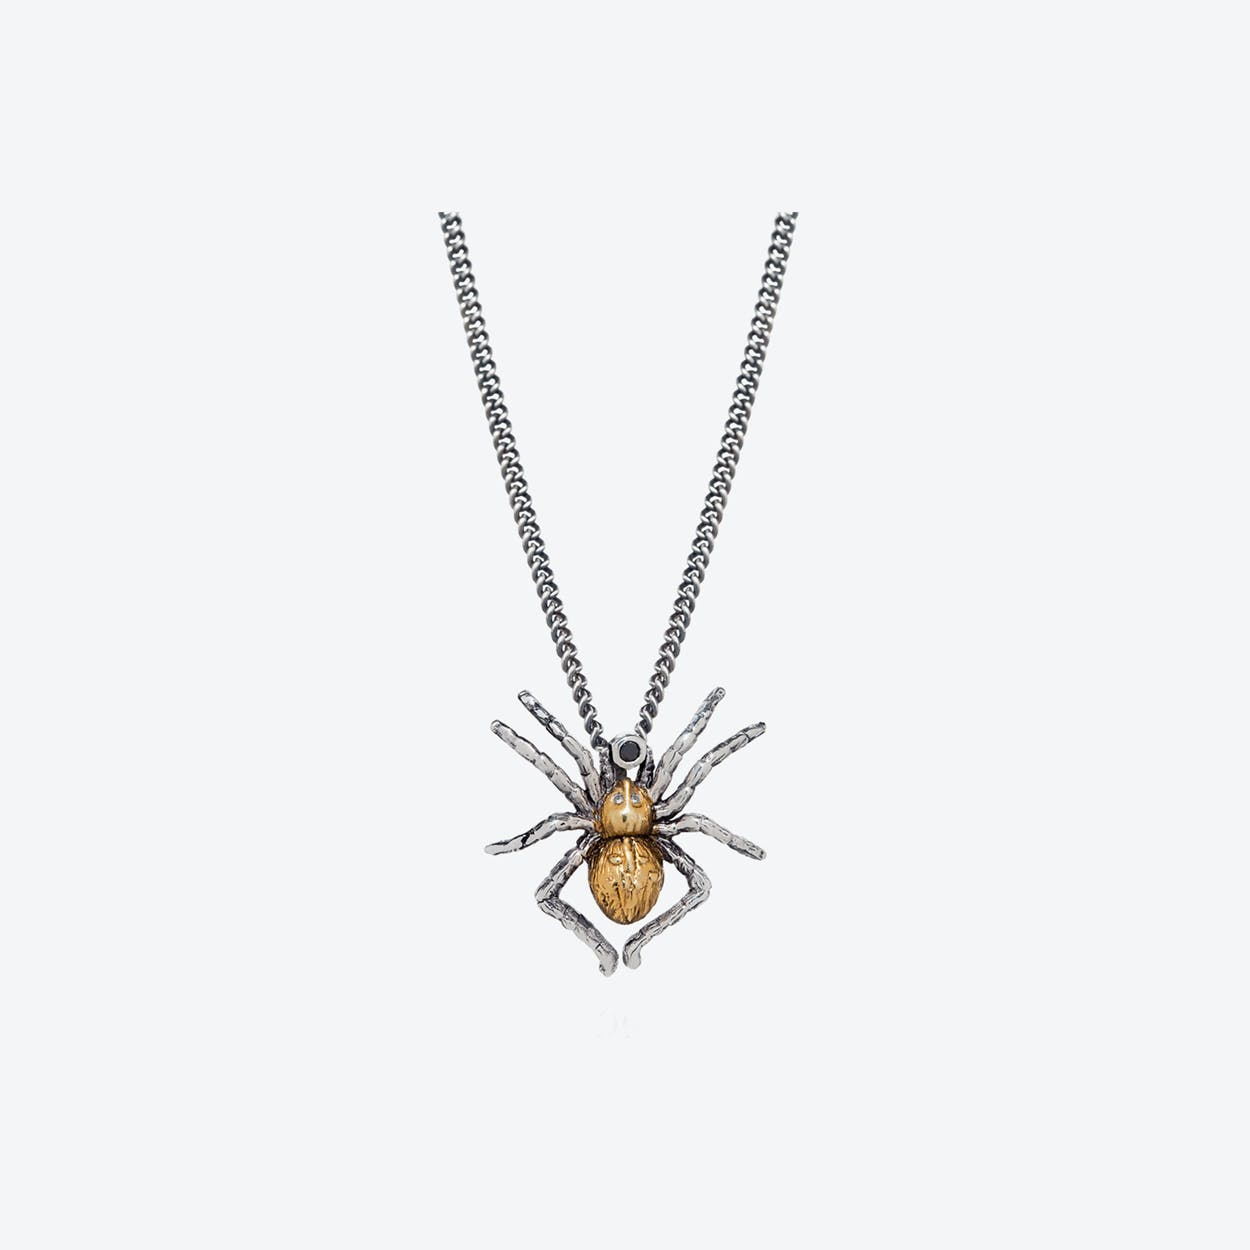 Gilded Spider Necklace